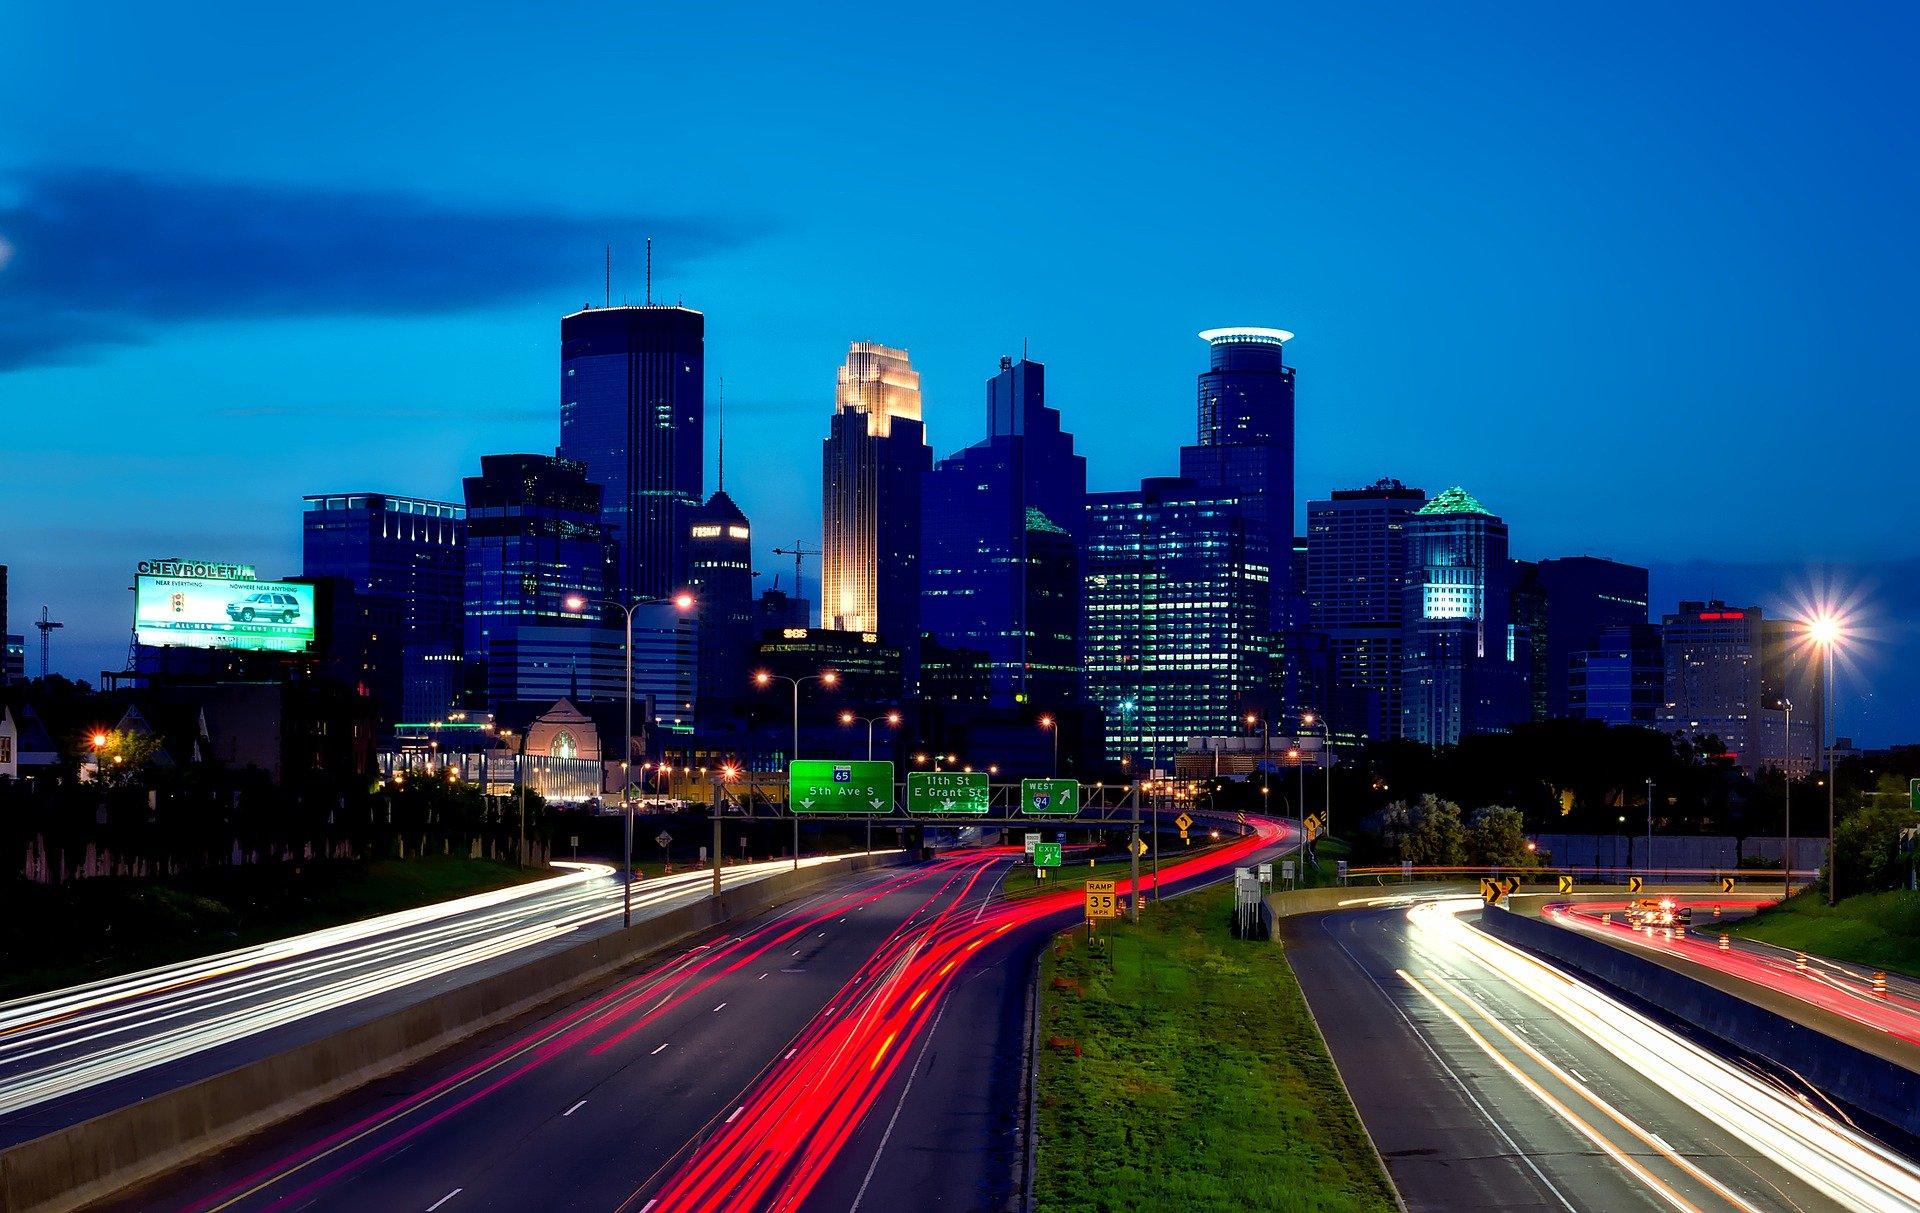 Downtown Minneapolis Minnesota - VeteranCarDonations.org